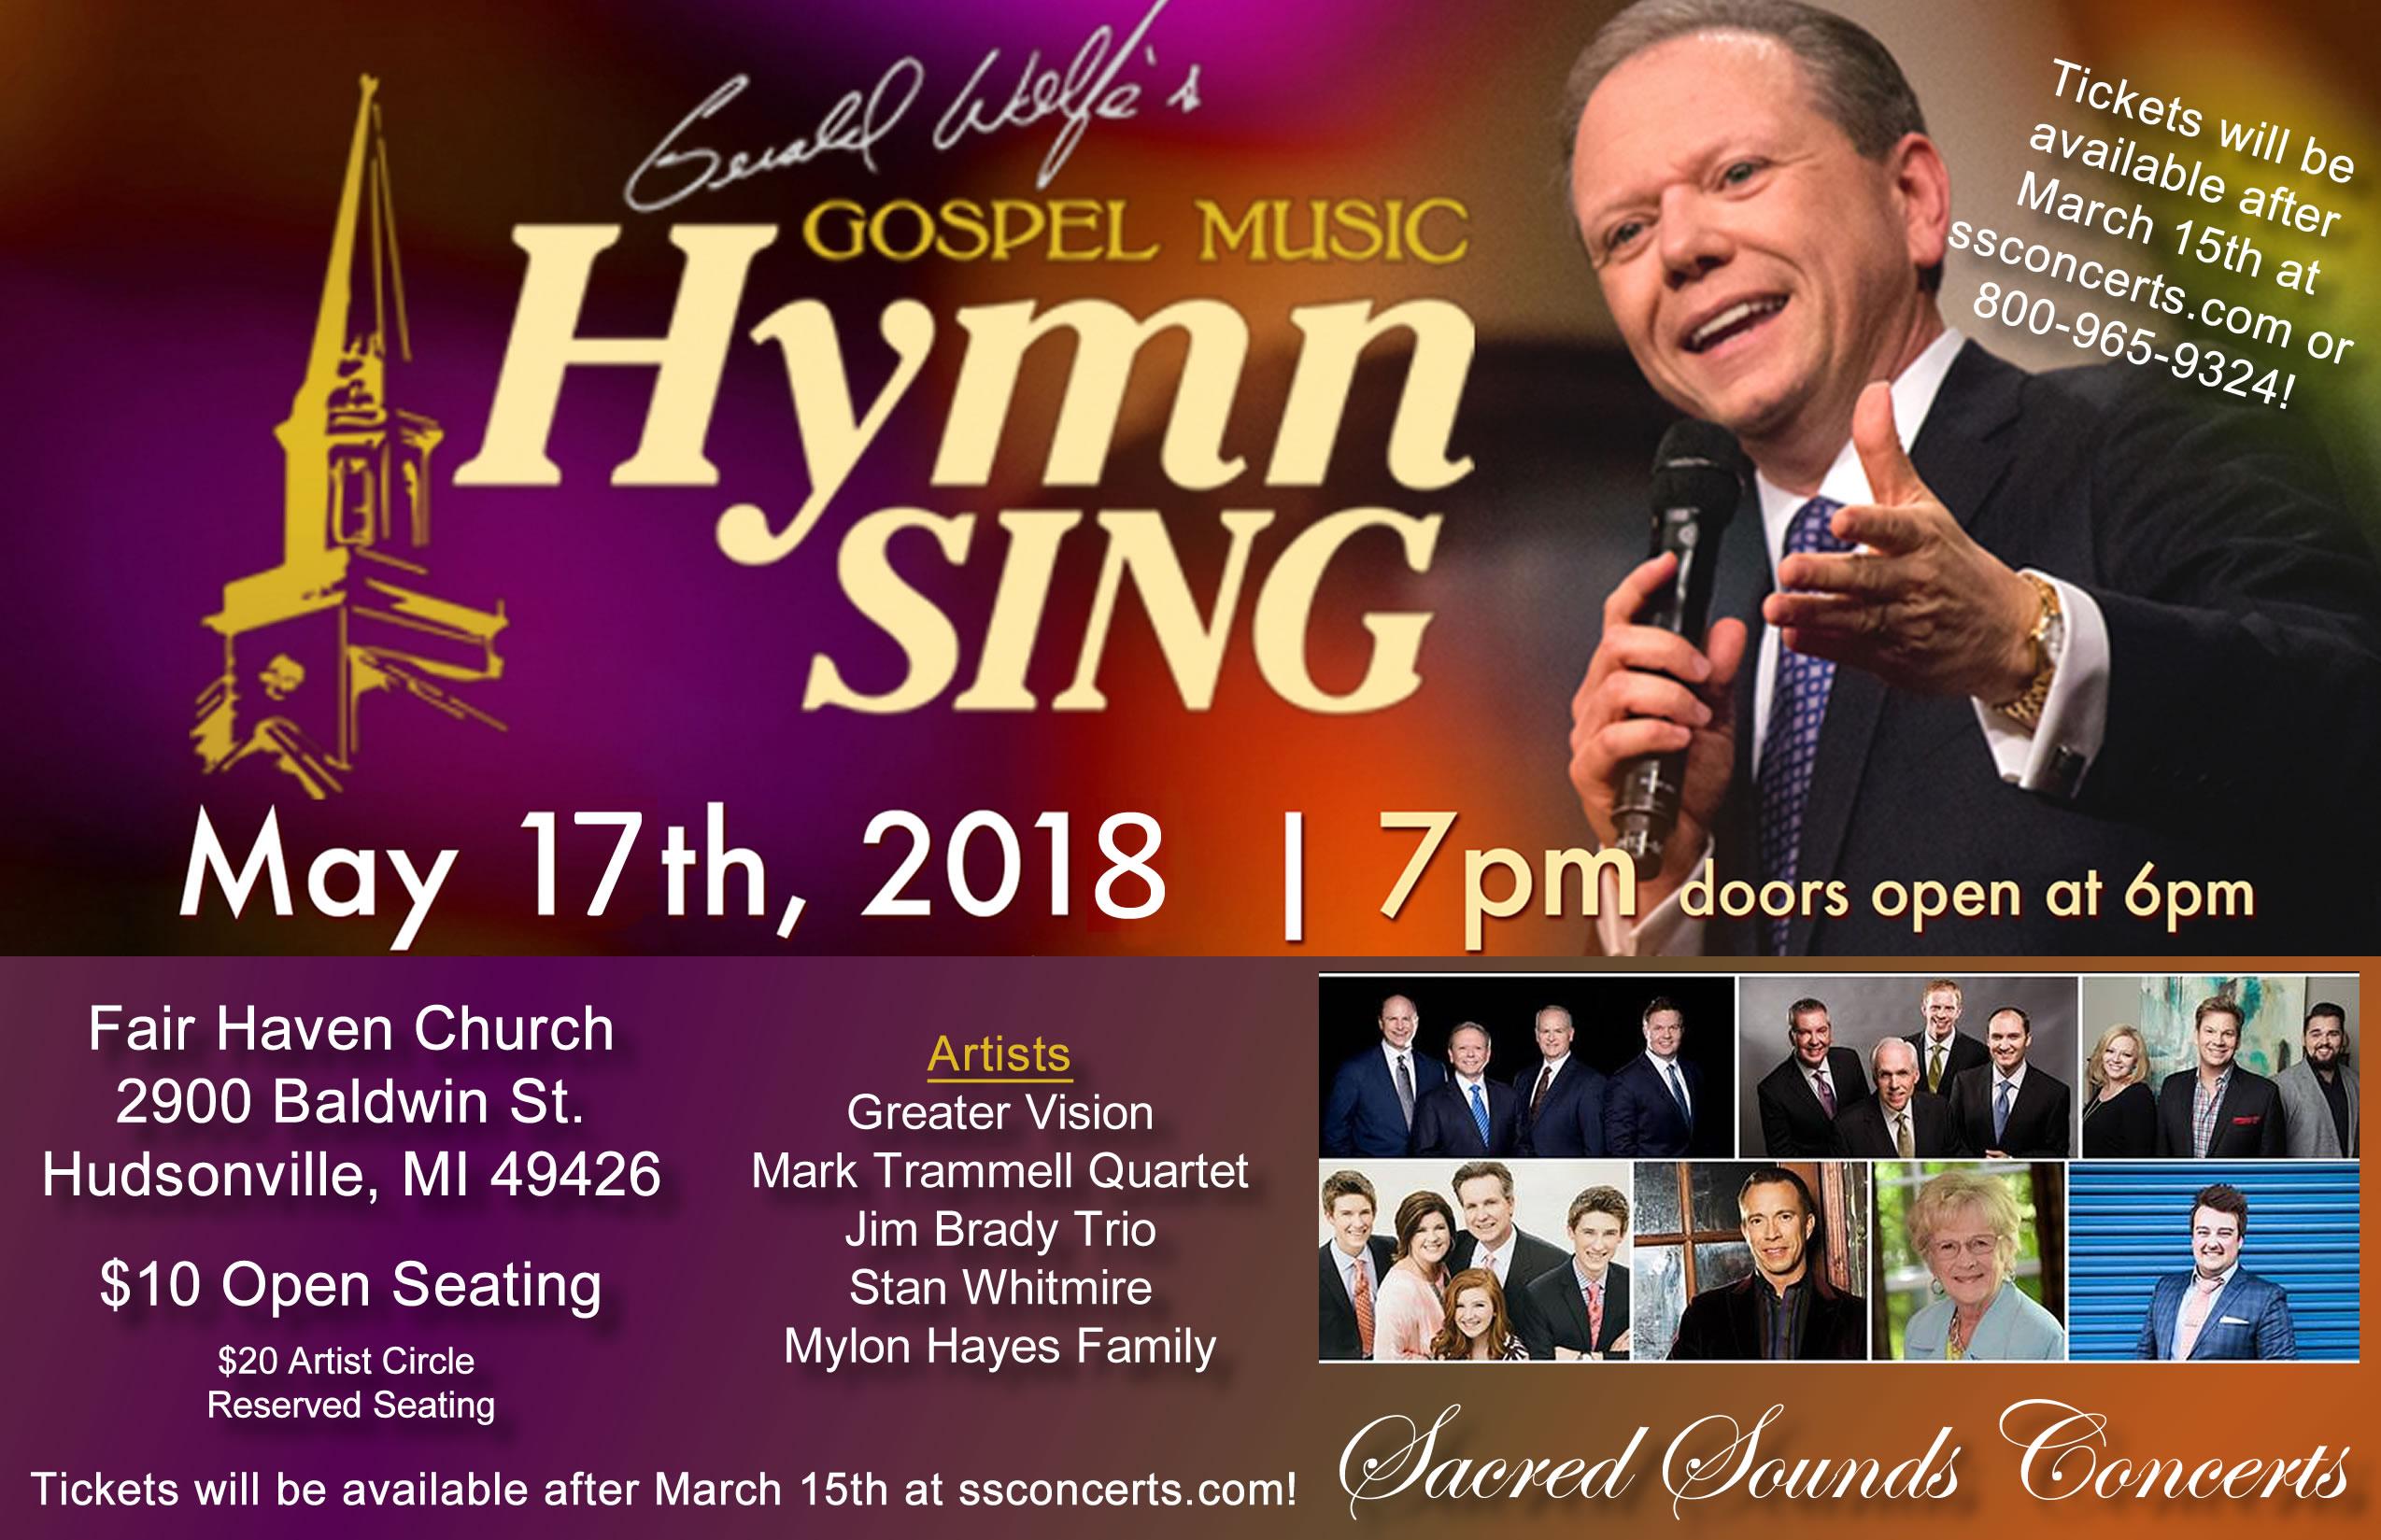 Gerald Wolfe Hymn Sing